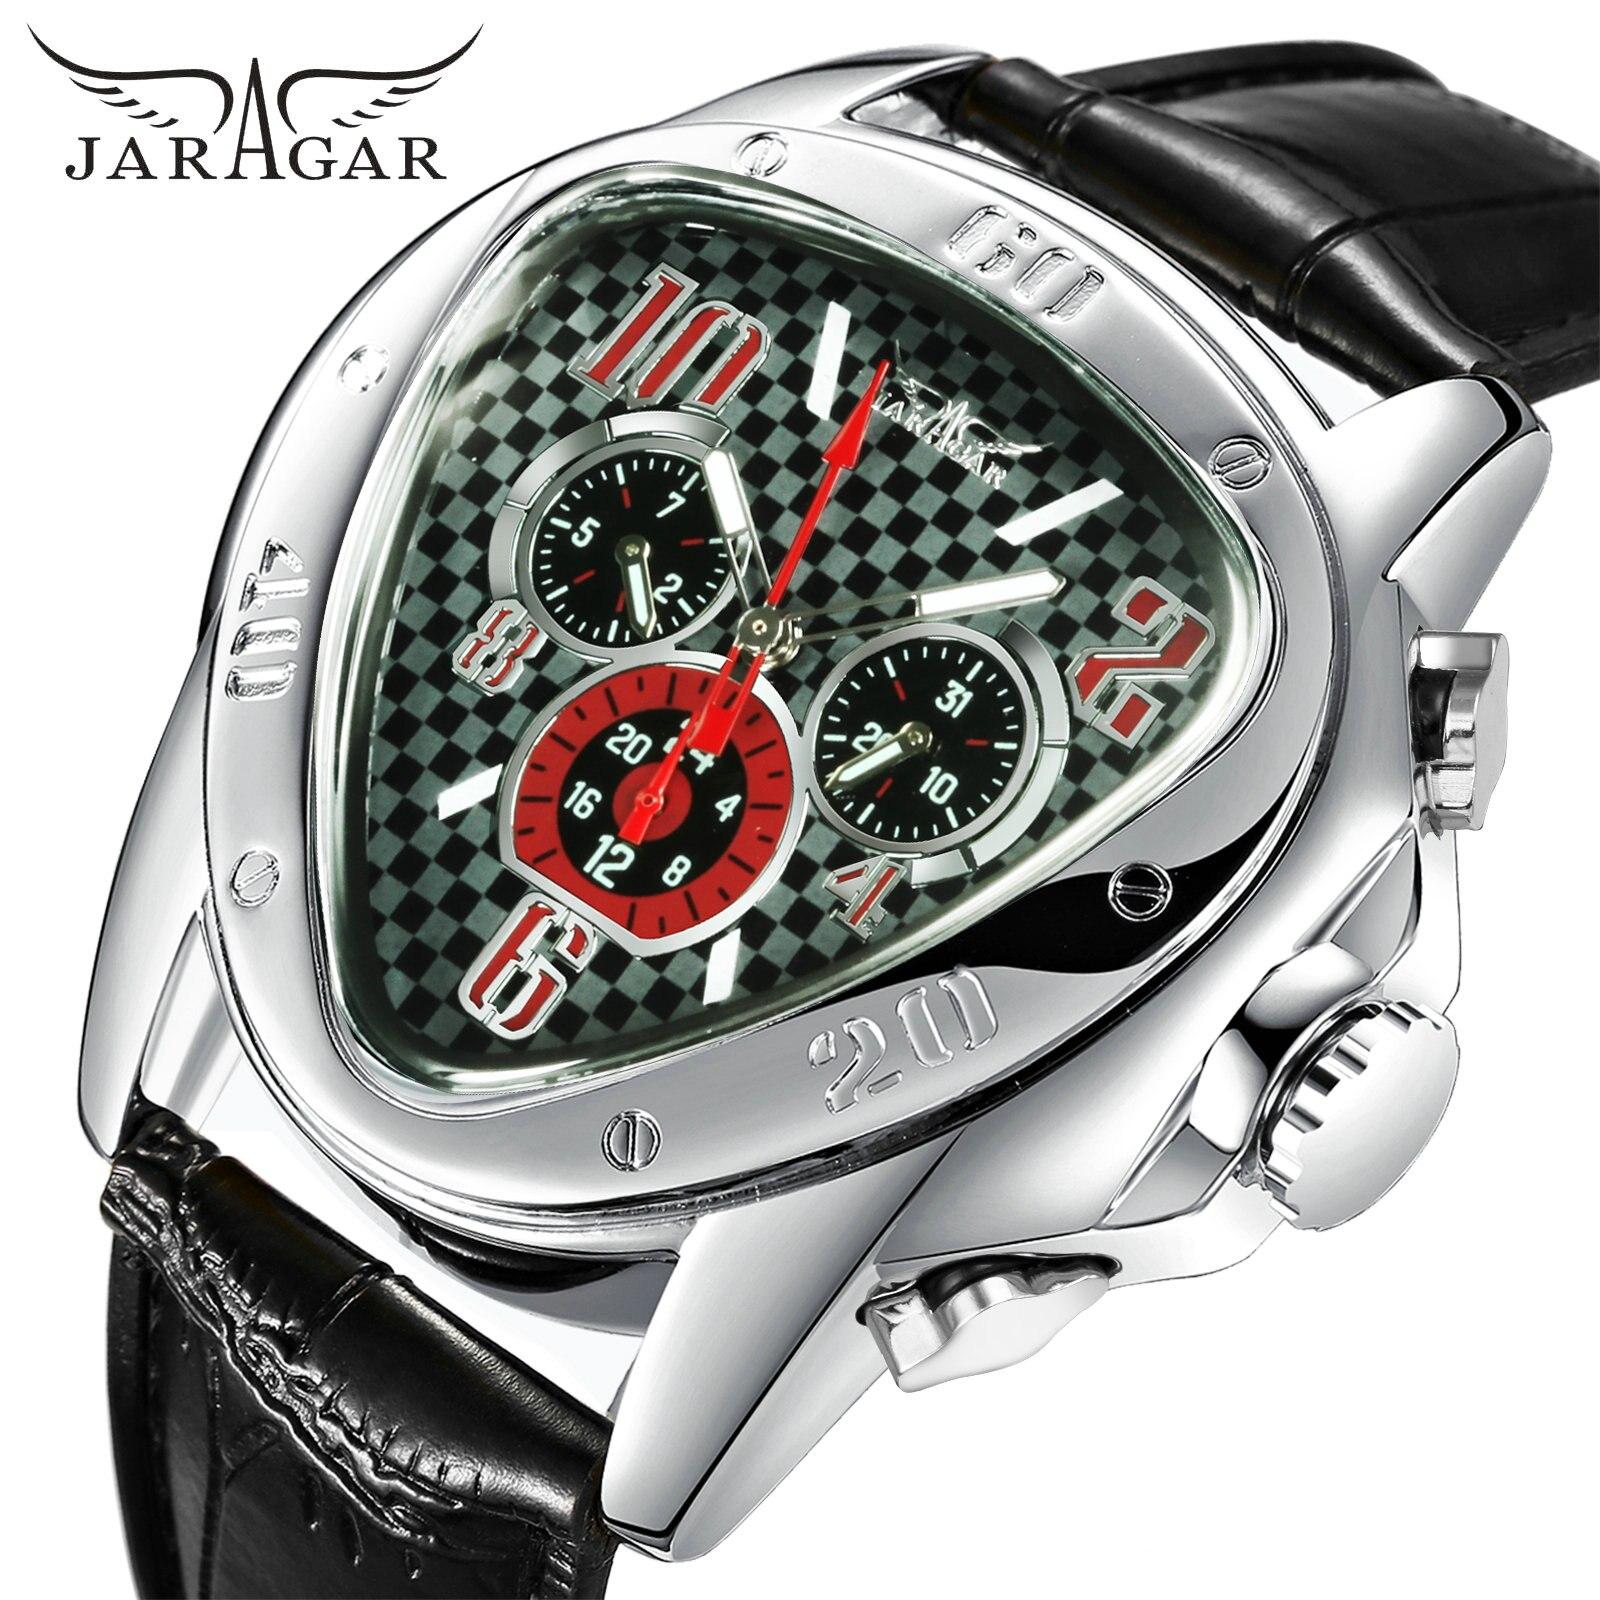 Novo 2020 marca de topo jaragar triângulo relógios masculinos moda luxo masculino relógios de pulso mecânico automático 3 sub-mostradores 6 mãos klok